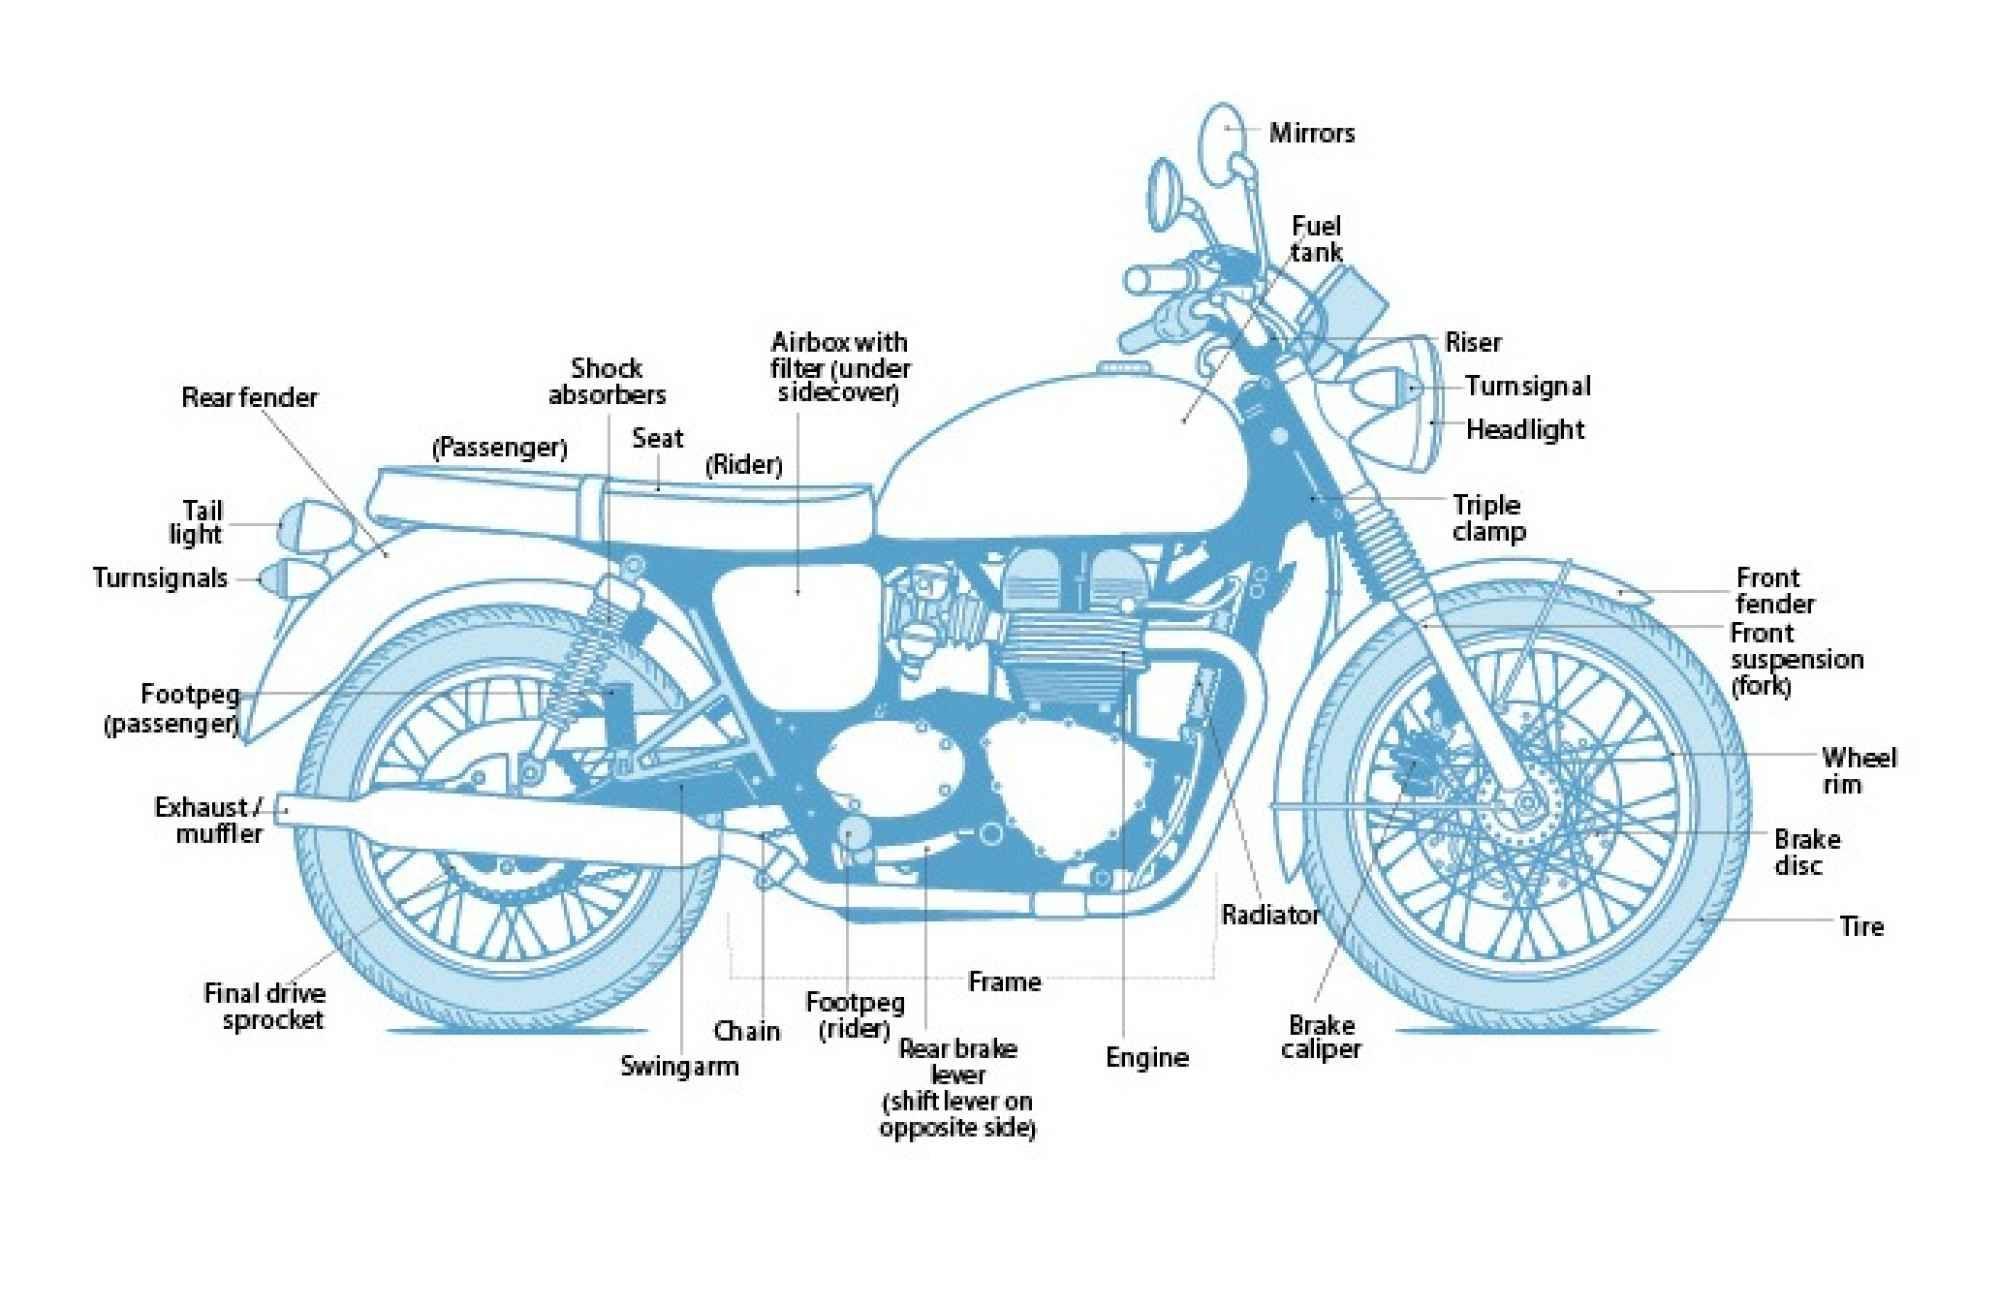 medium resolution of motorcycle diagram motorcycles cafe racer bikes motorcycle harley davidson motorcycle engine diagram harley davidson motorcycle diagrams